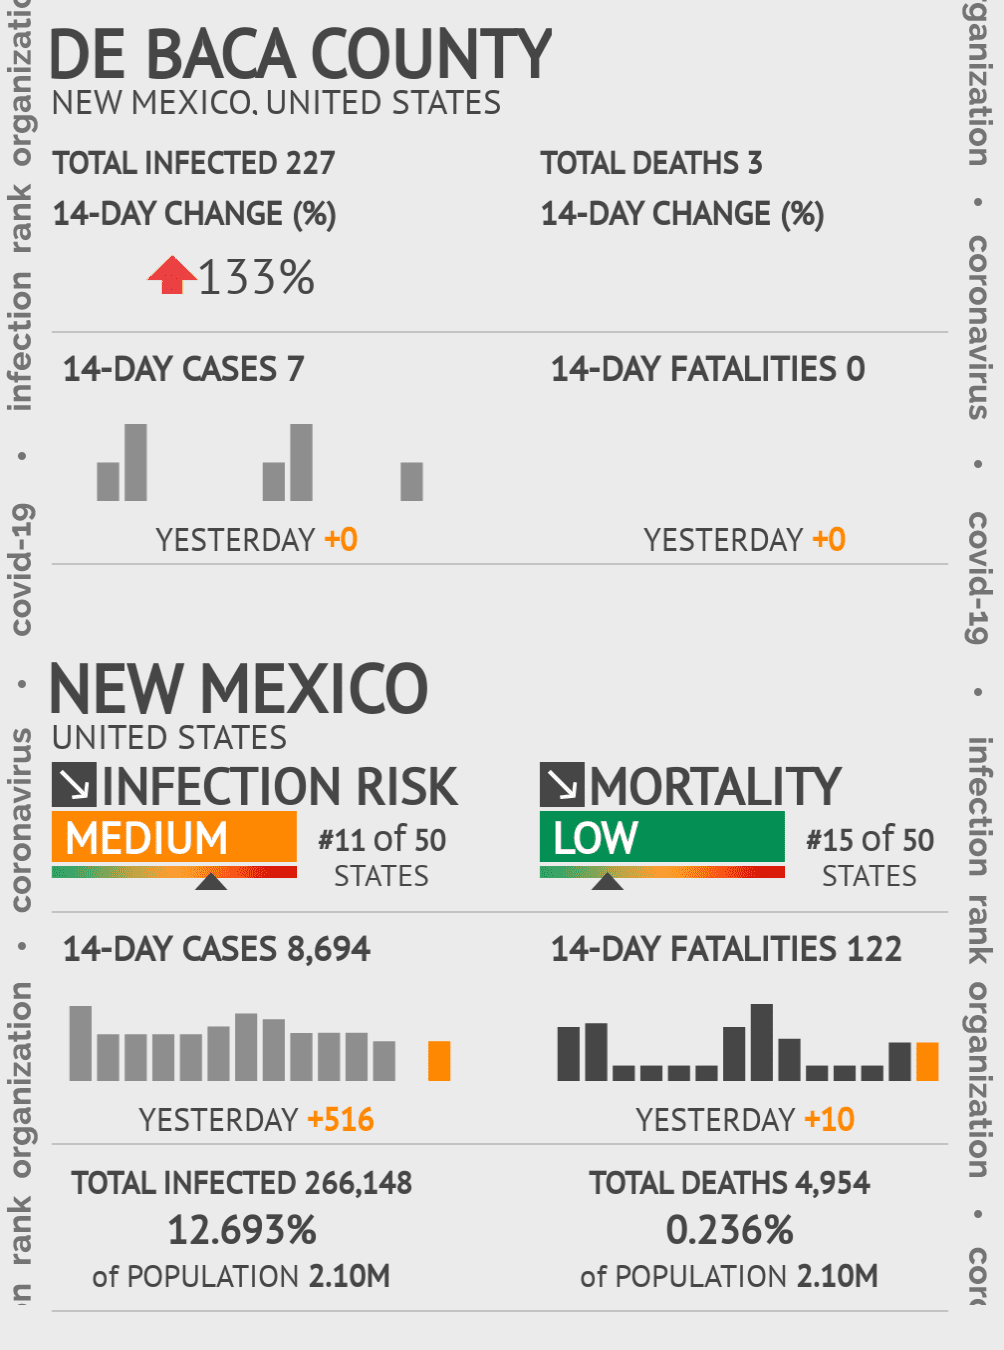 De Baca County Coronavirus Covid-19 Risk of Infection on July 24, 2021